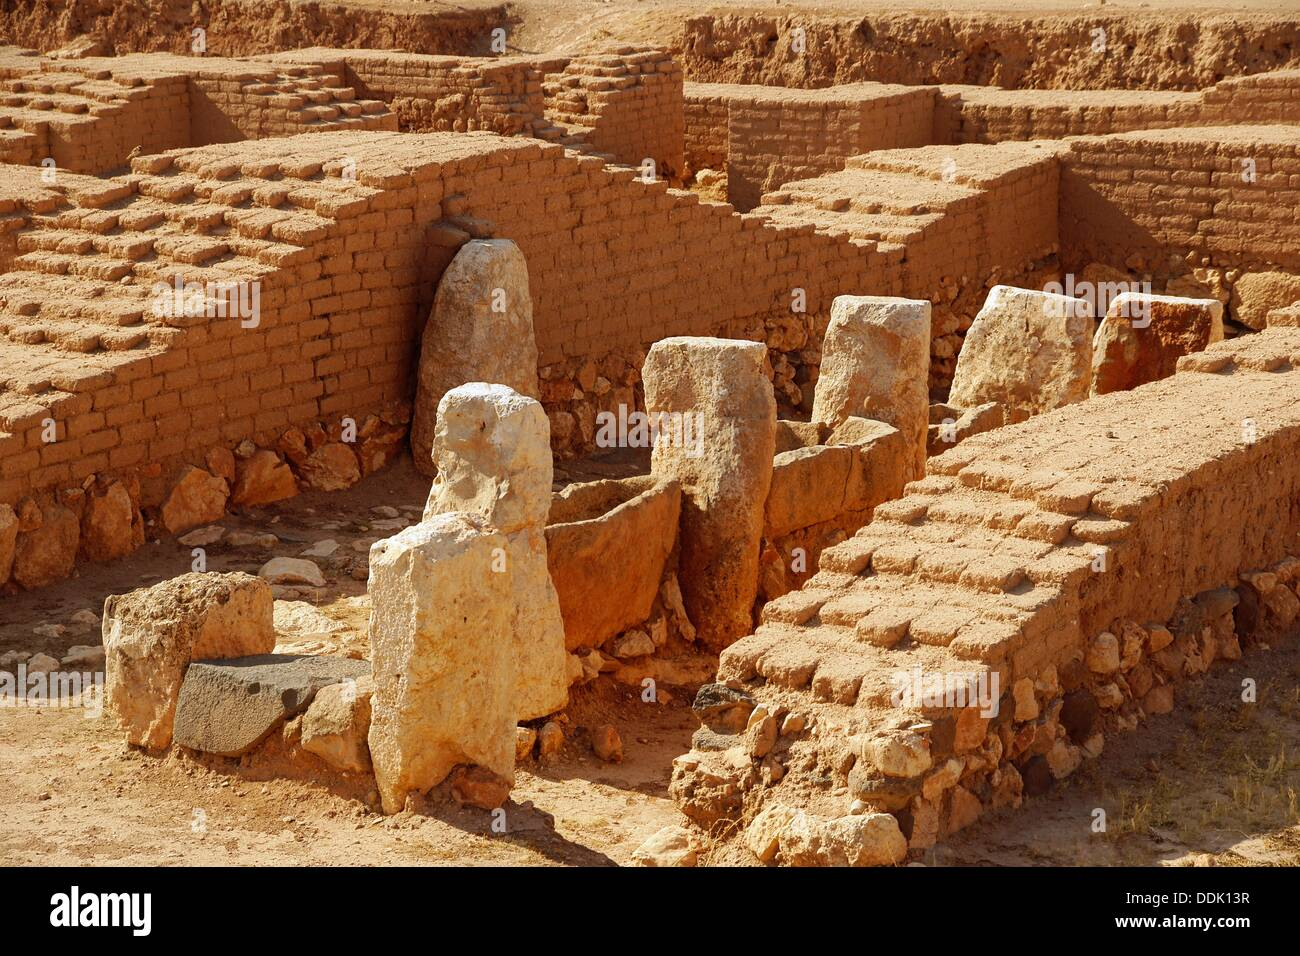 Syria, Ebla, wool dying area, at the Royal Palace, 4.000-3.000 BC - Stock Image